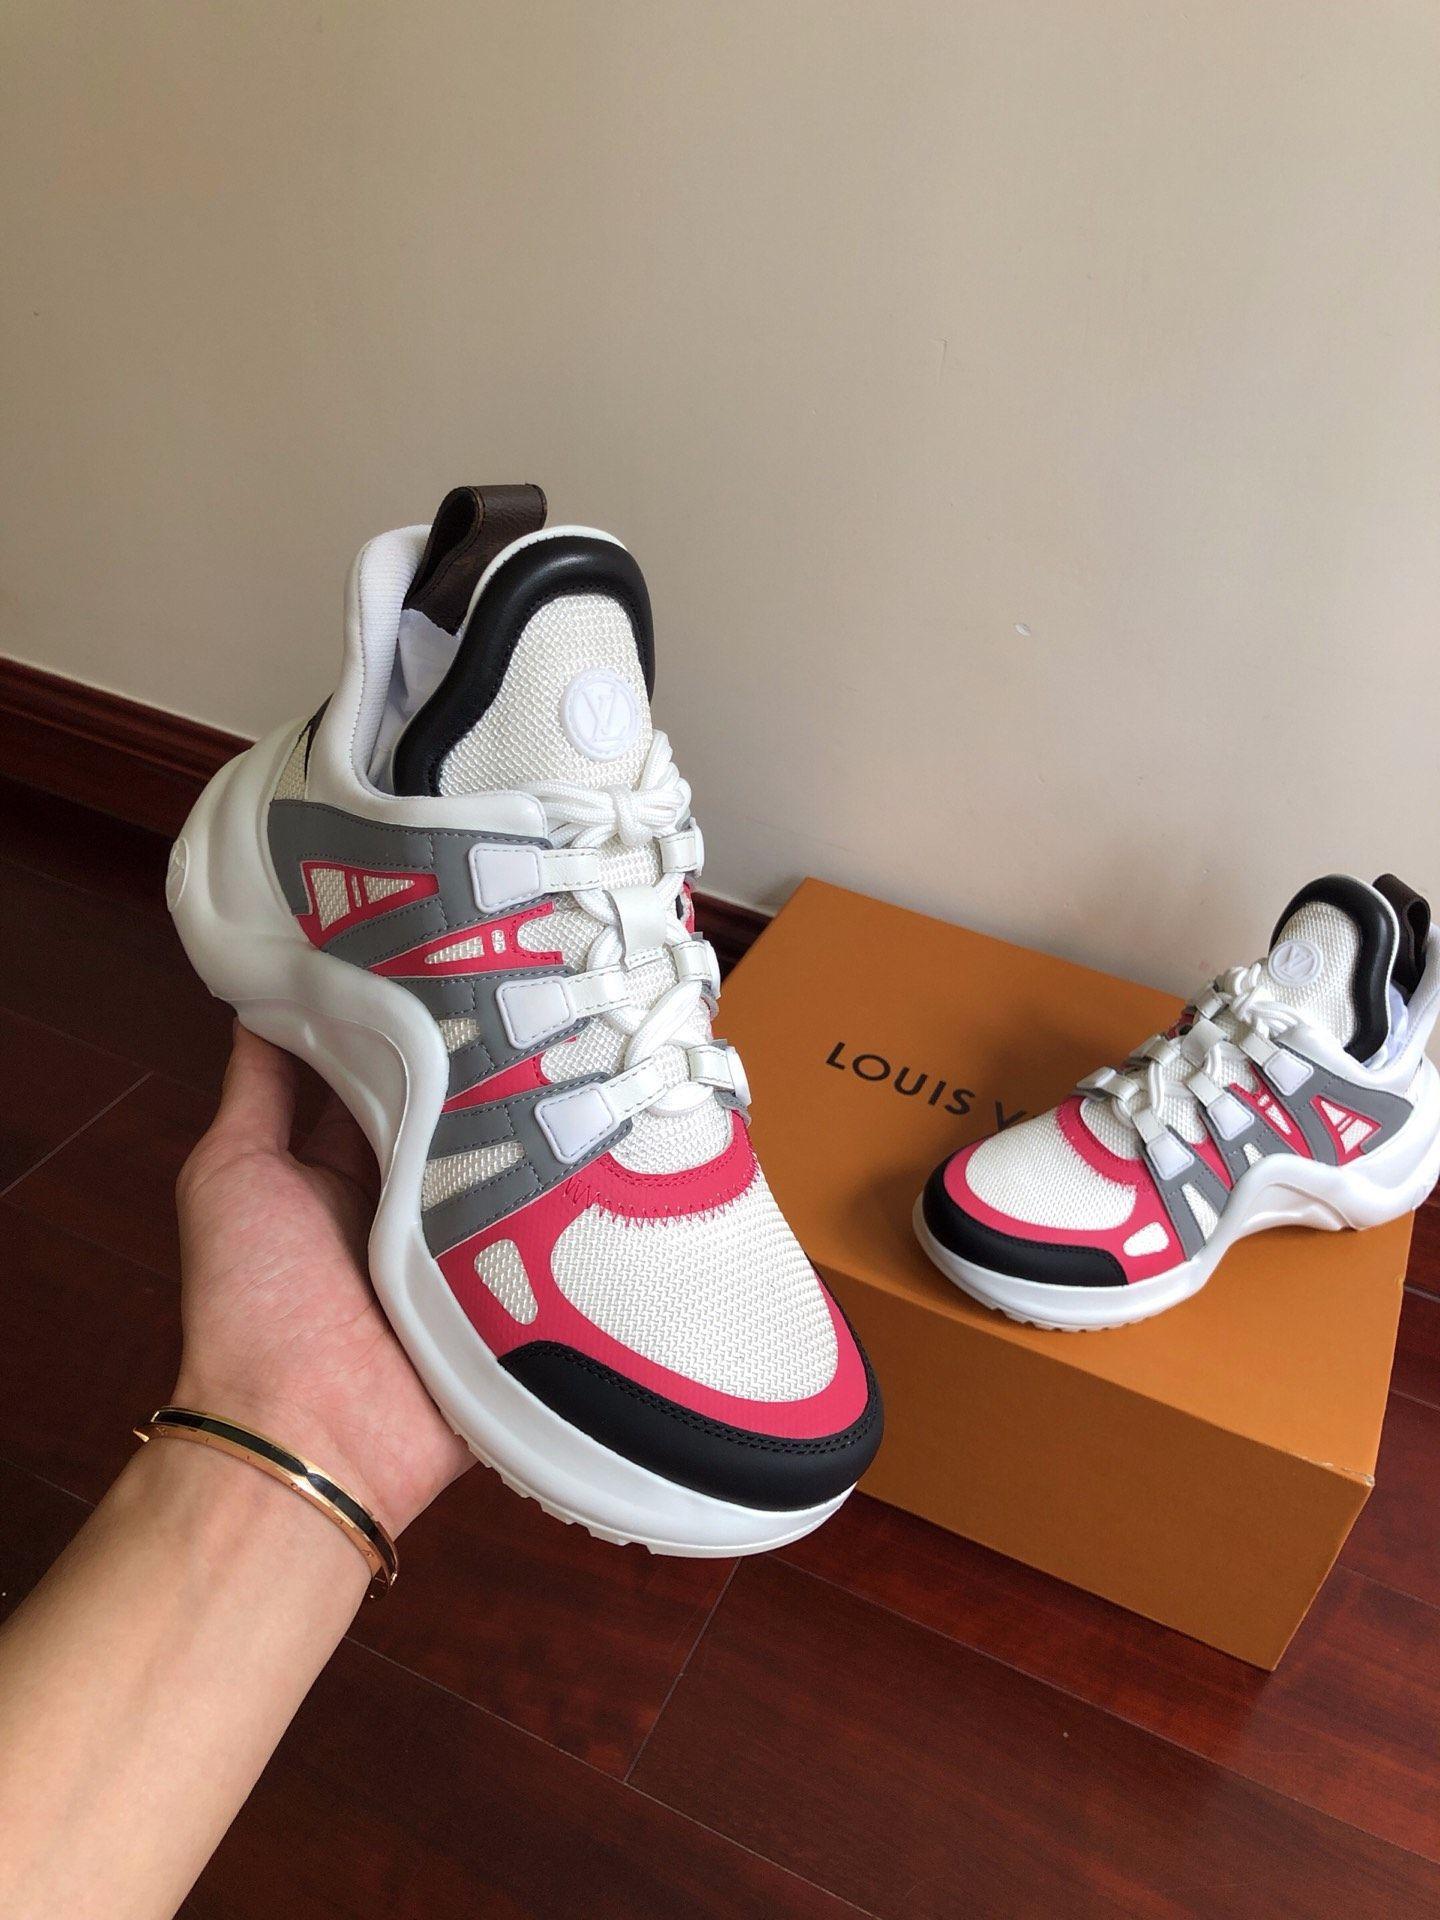 newest    archlight sneaker Rose Clair Pink  1A4X75    women sneaker  7